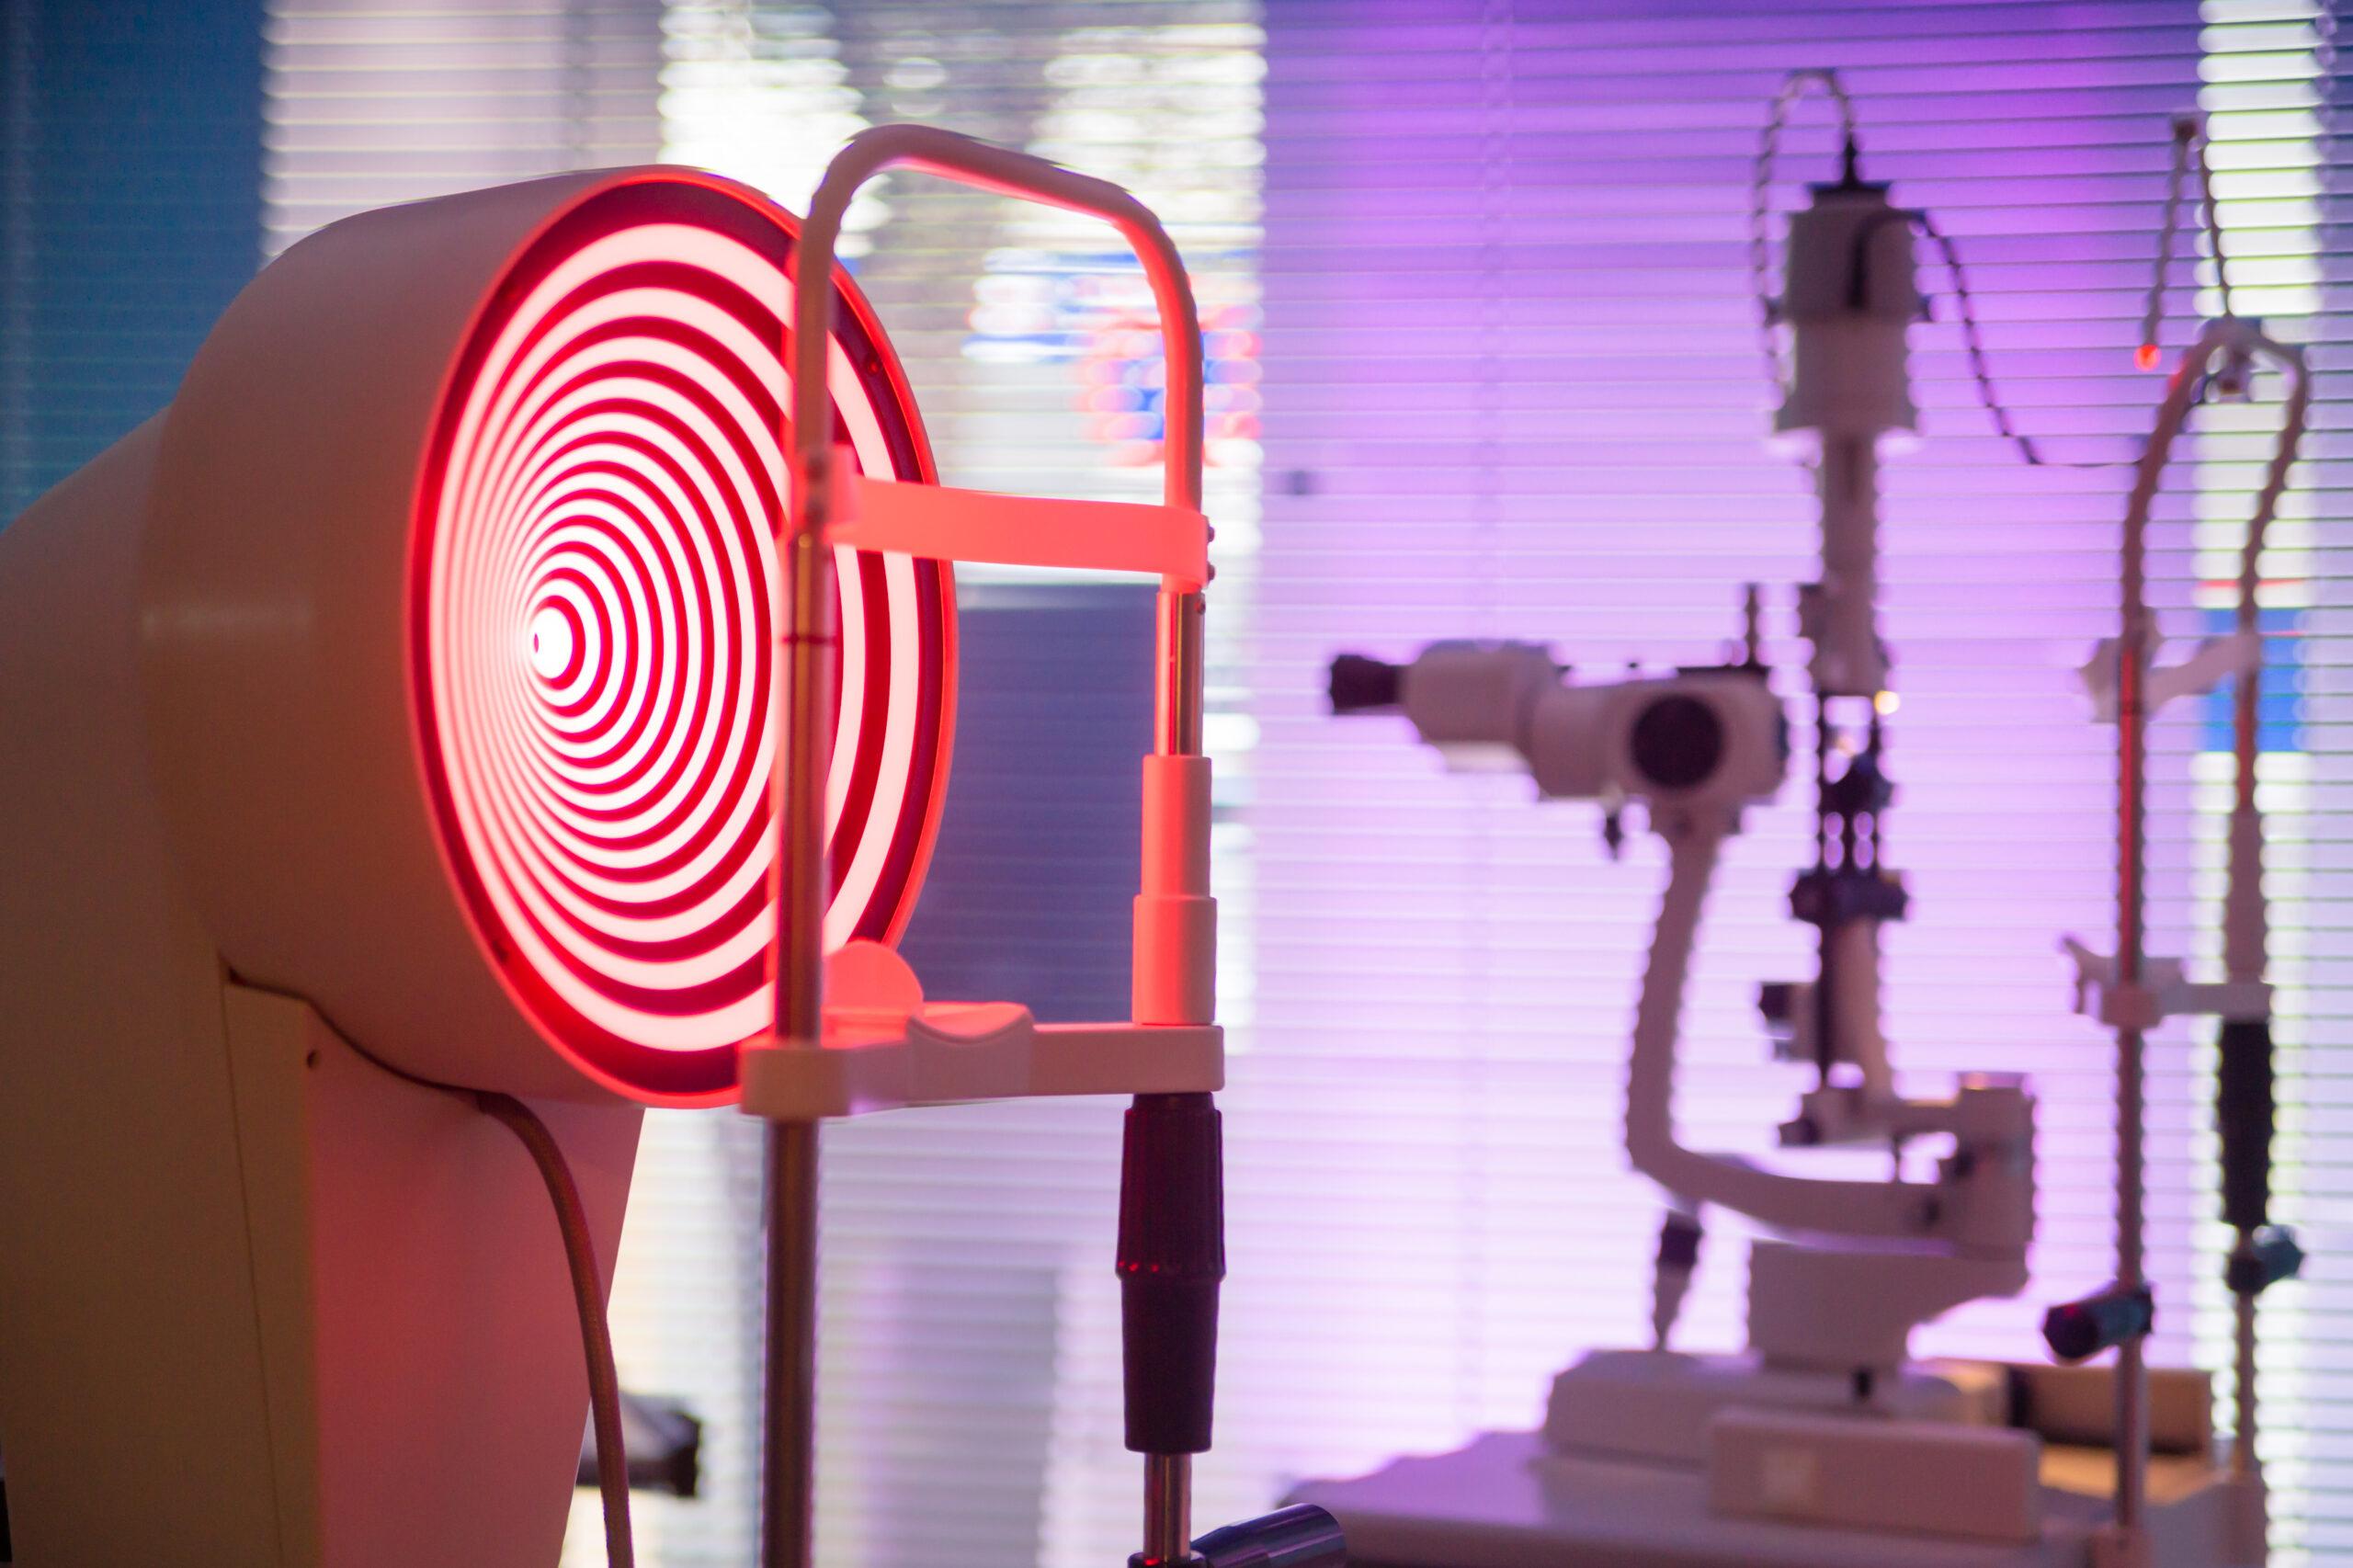 Imaging Technology